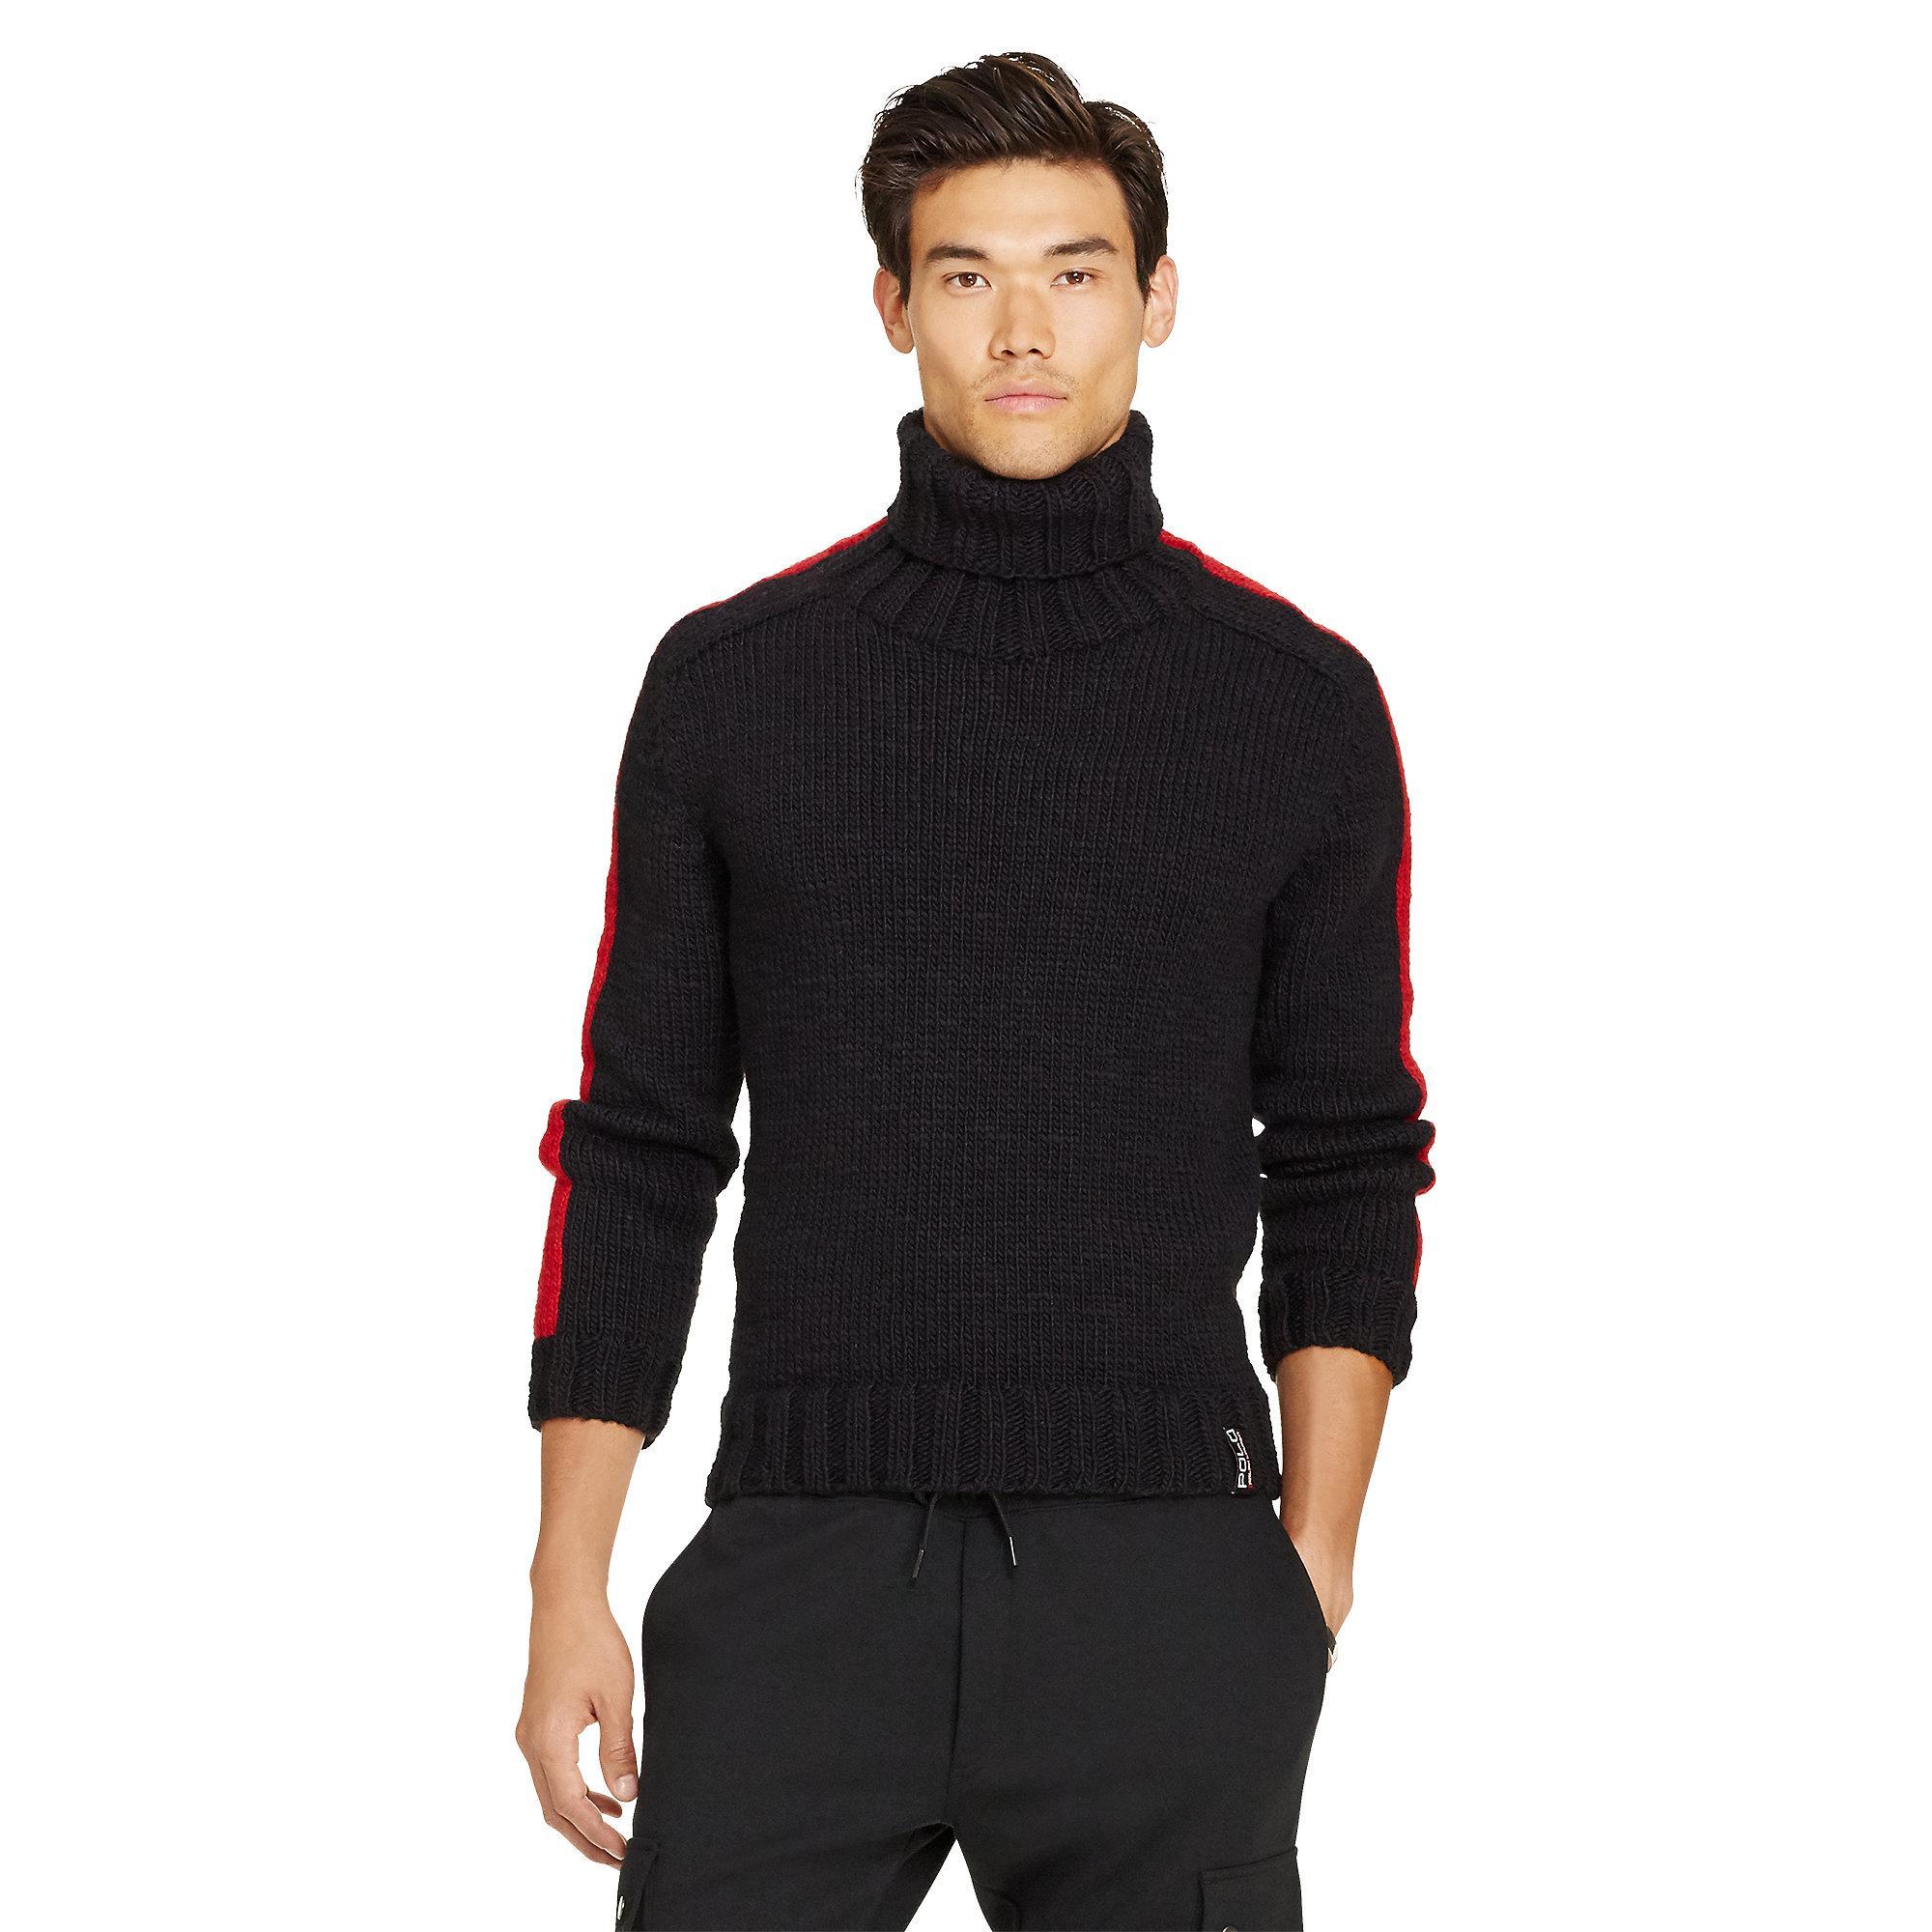 polo ralph lauren merino wool turtleneck sweater in black for men lyst. Black Bedroom Furniture Sets. Home Design Ideas